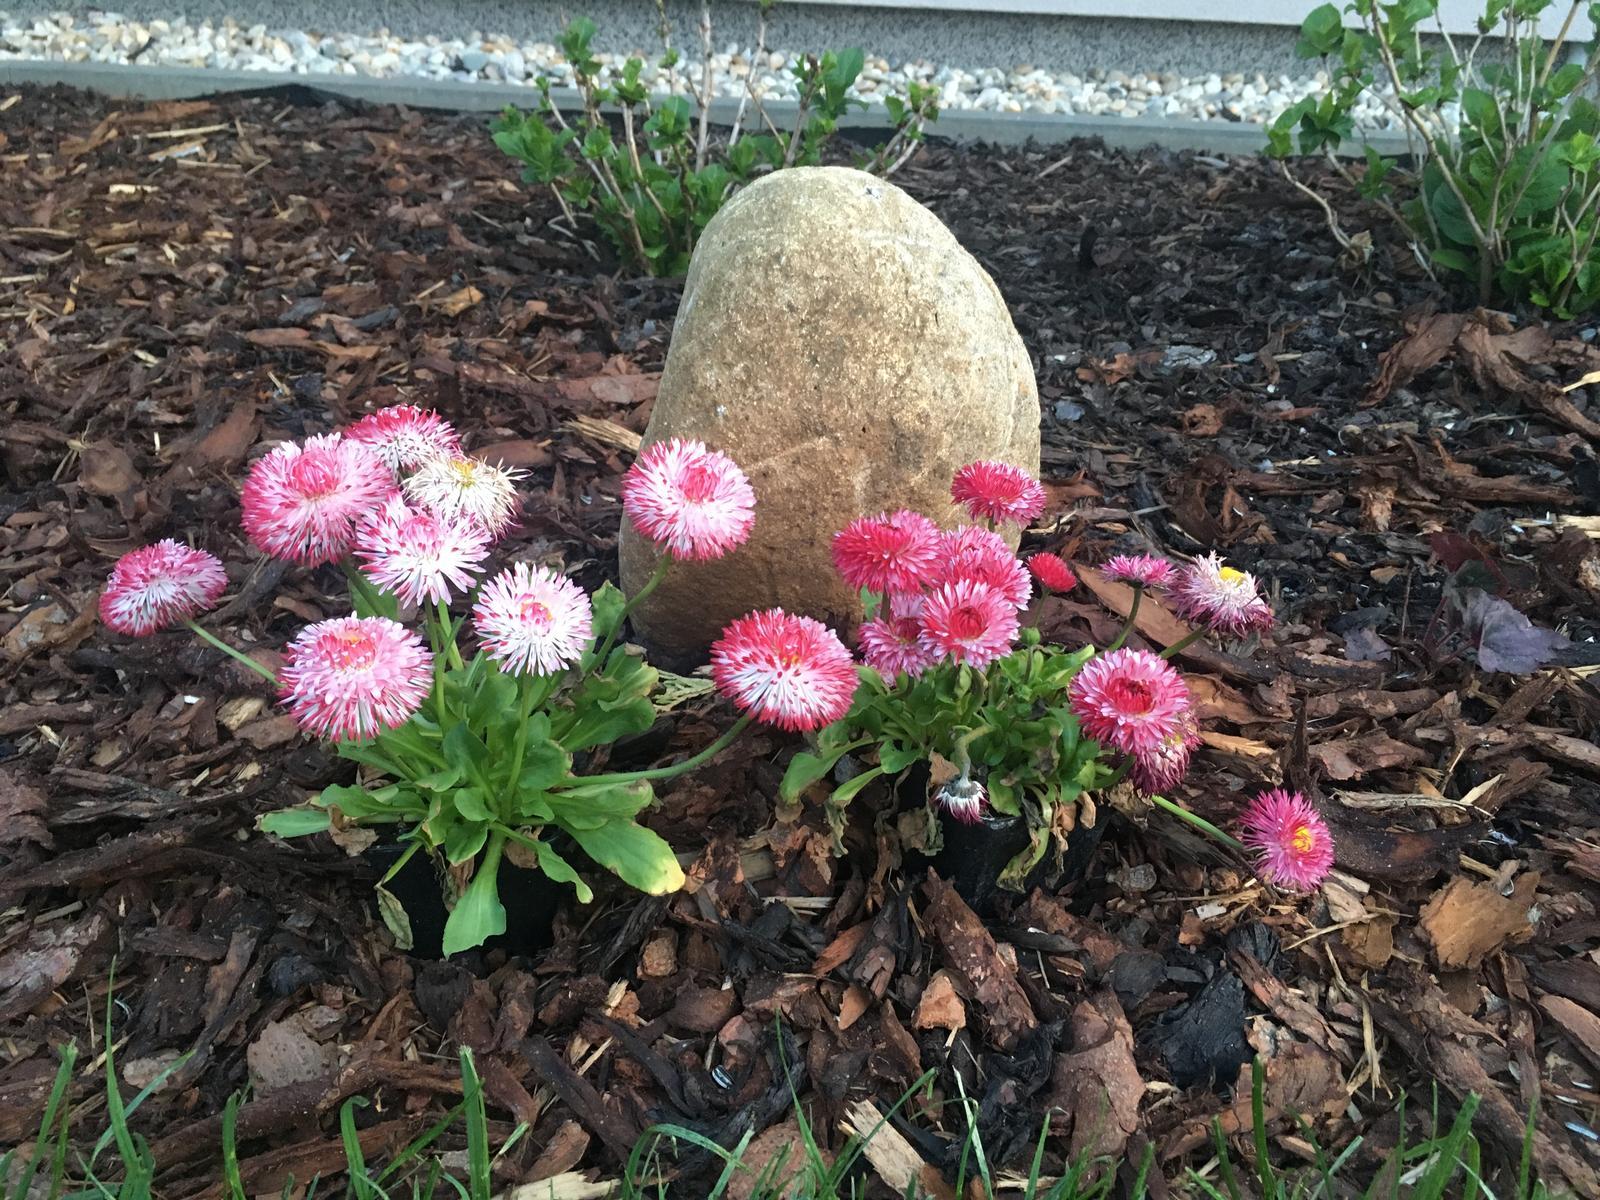 Naše zahradka s láskou ❤️ - Sedmikrásky